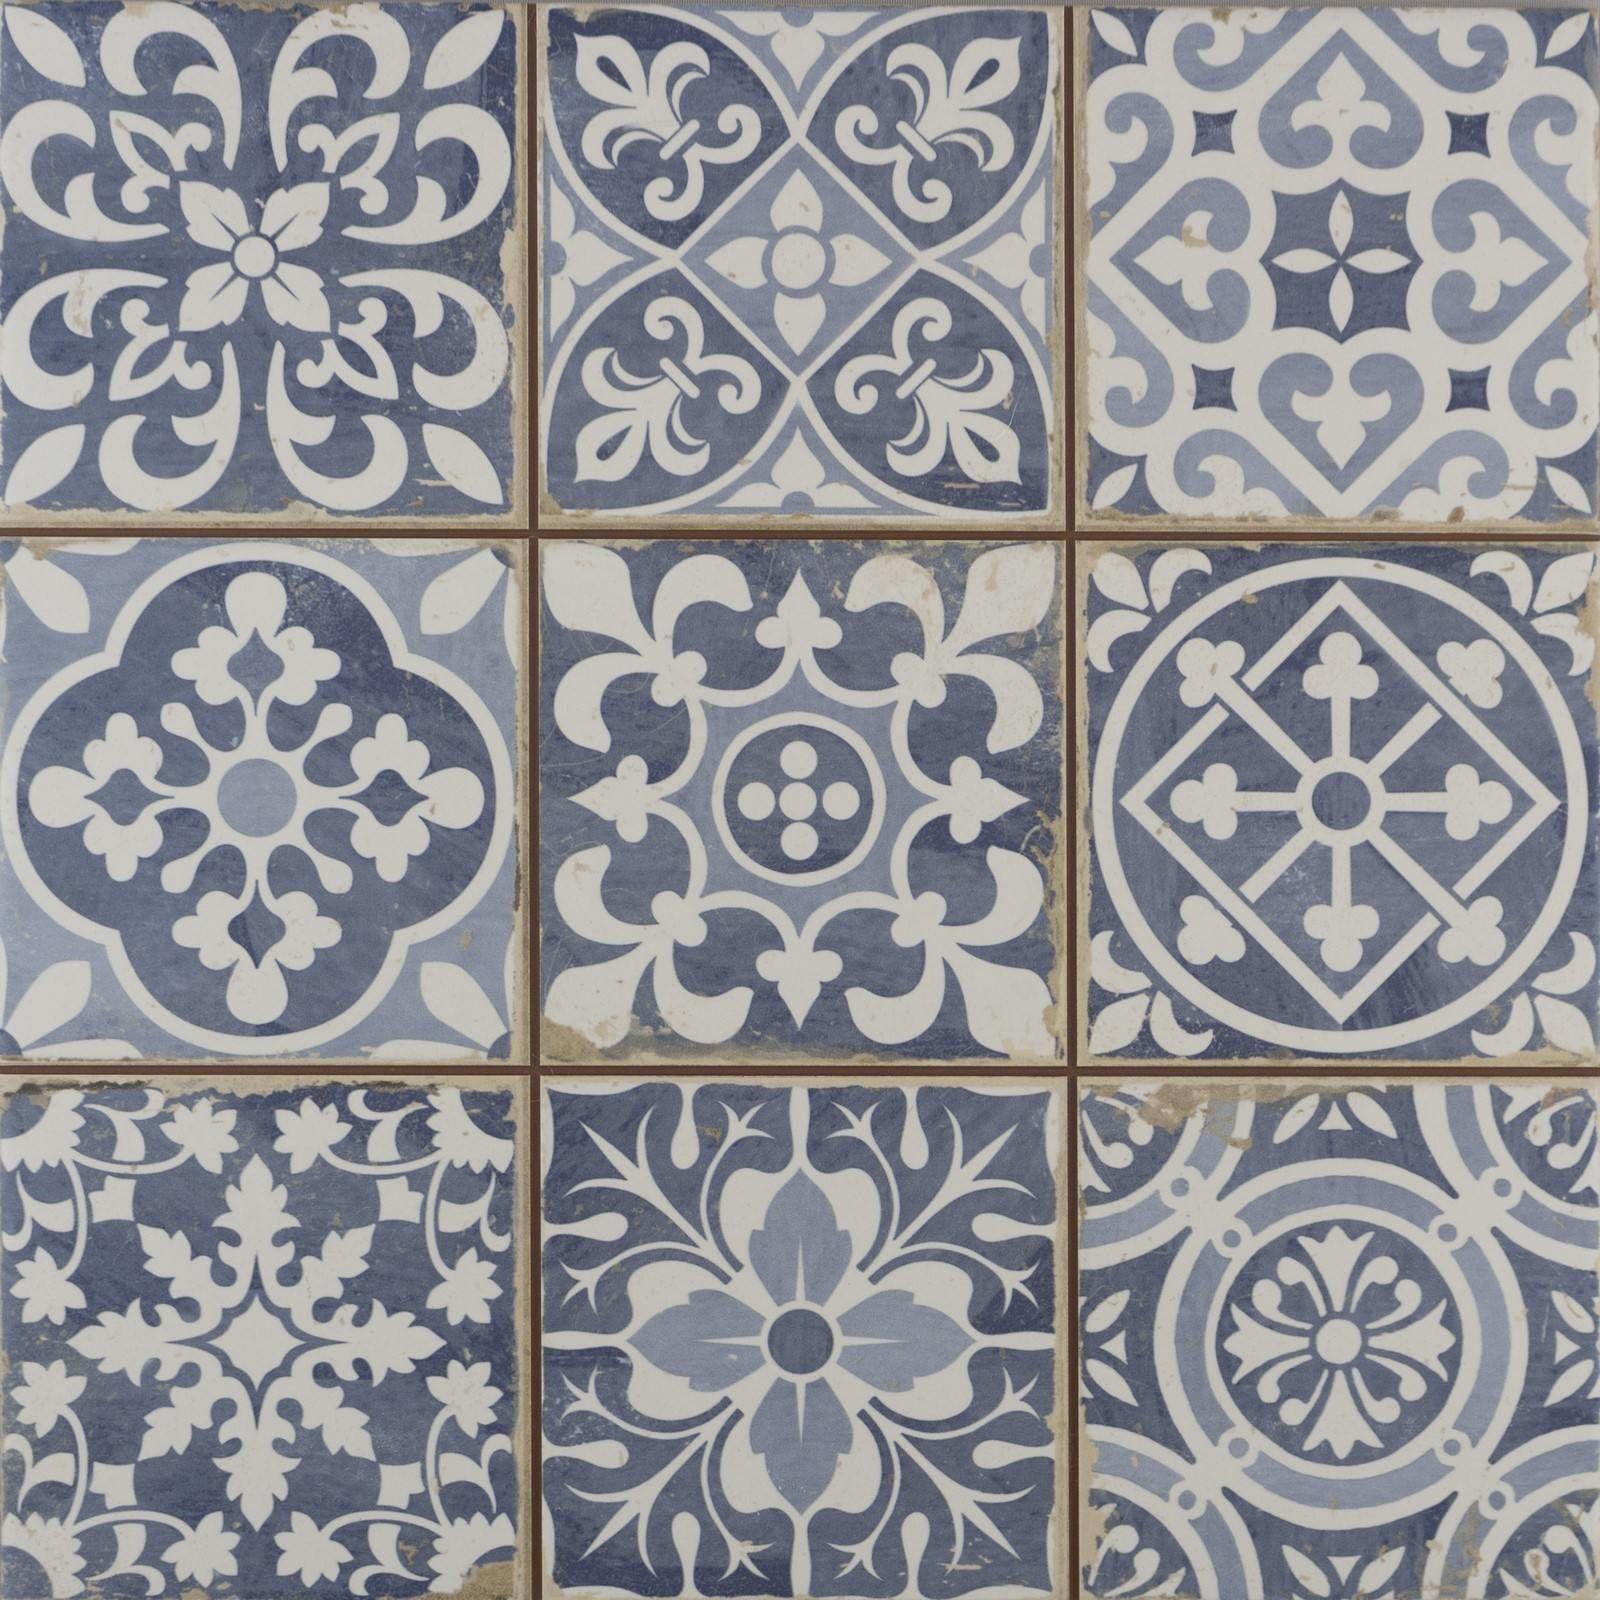 Faenza Rustic Blue Patterned Matt Tiles Victorian Tiles Blue